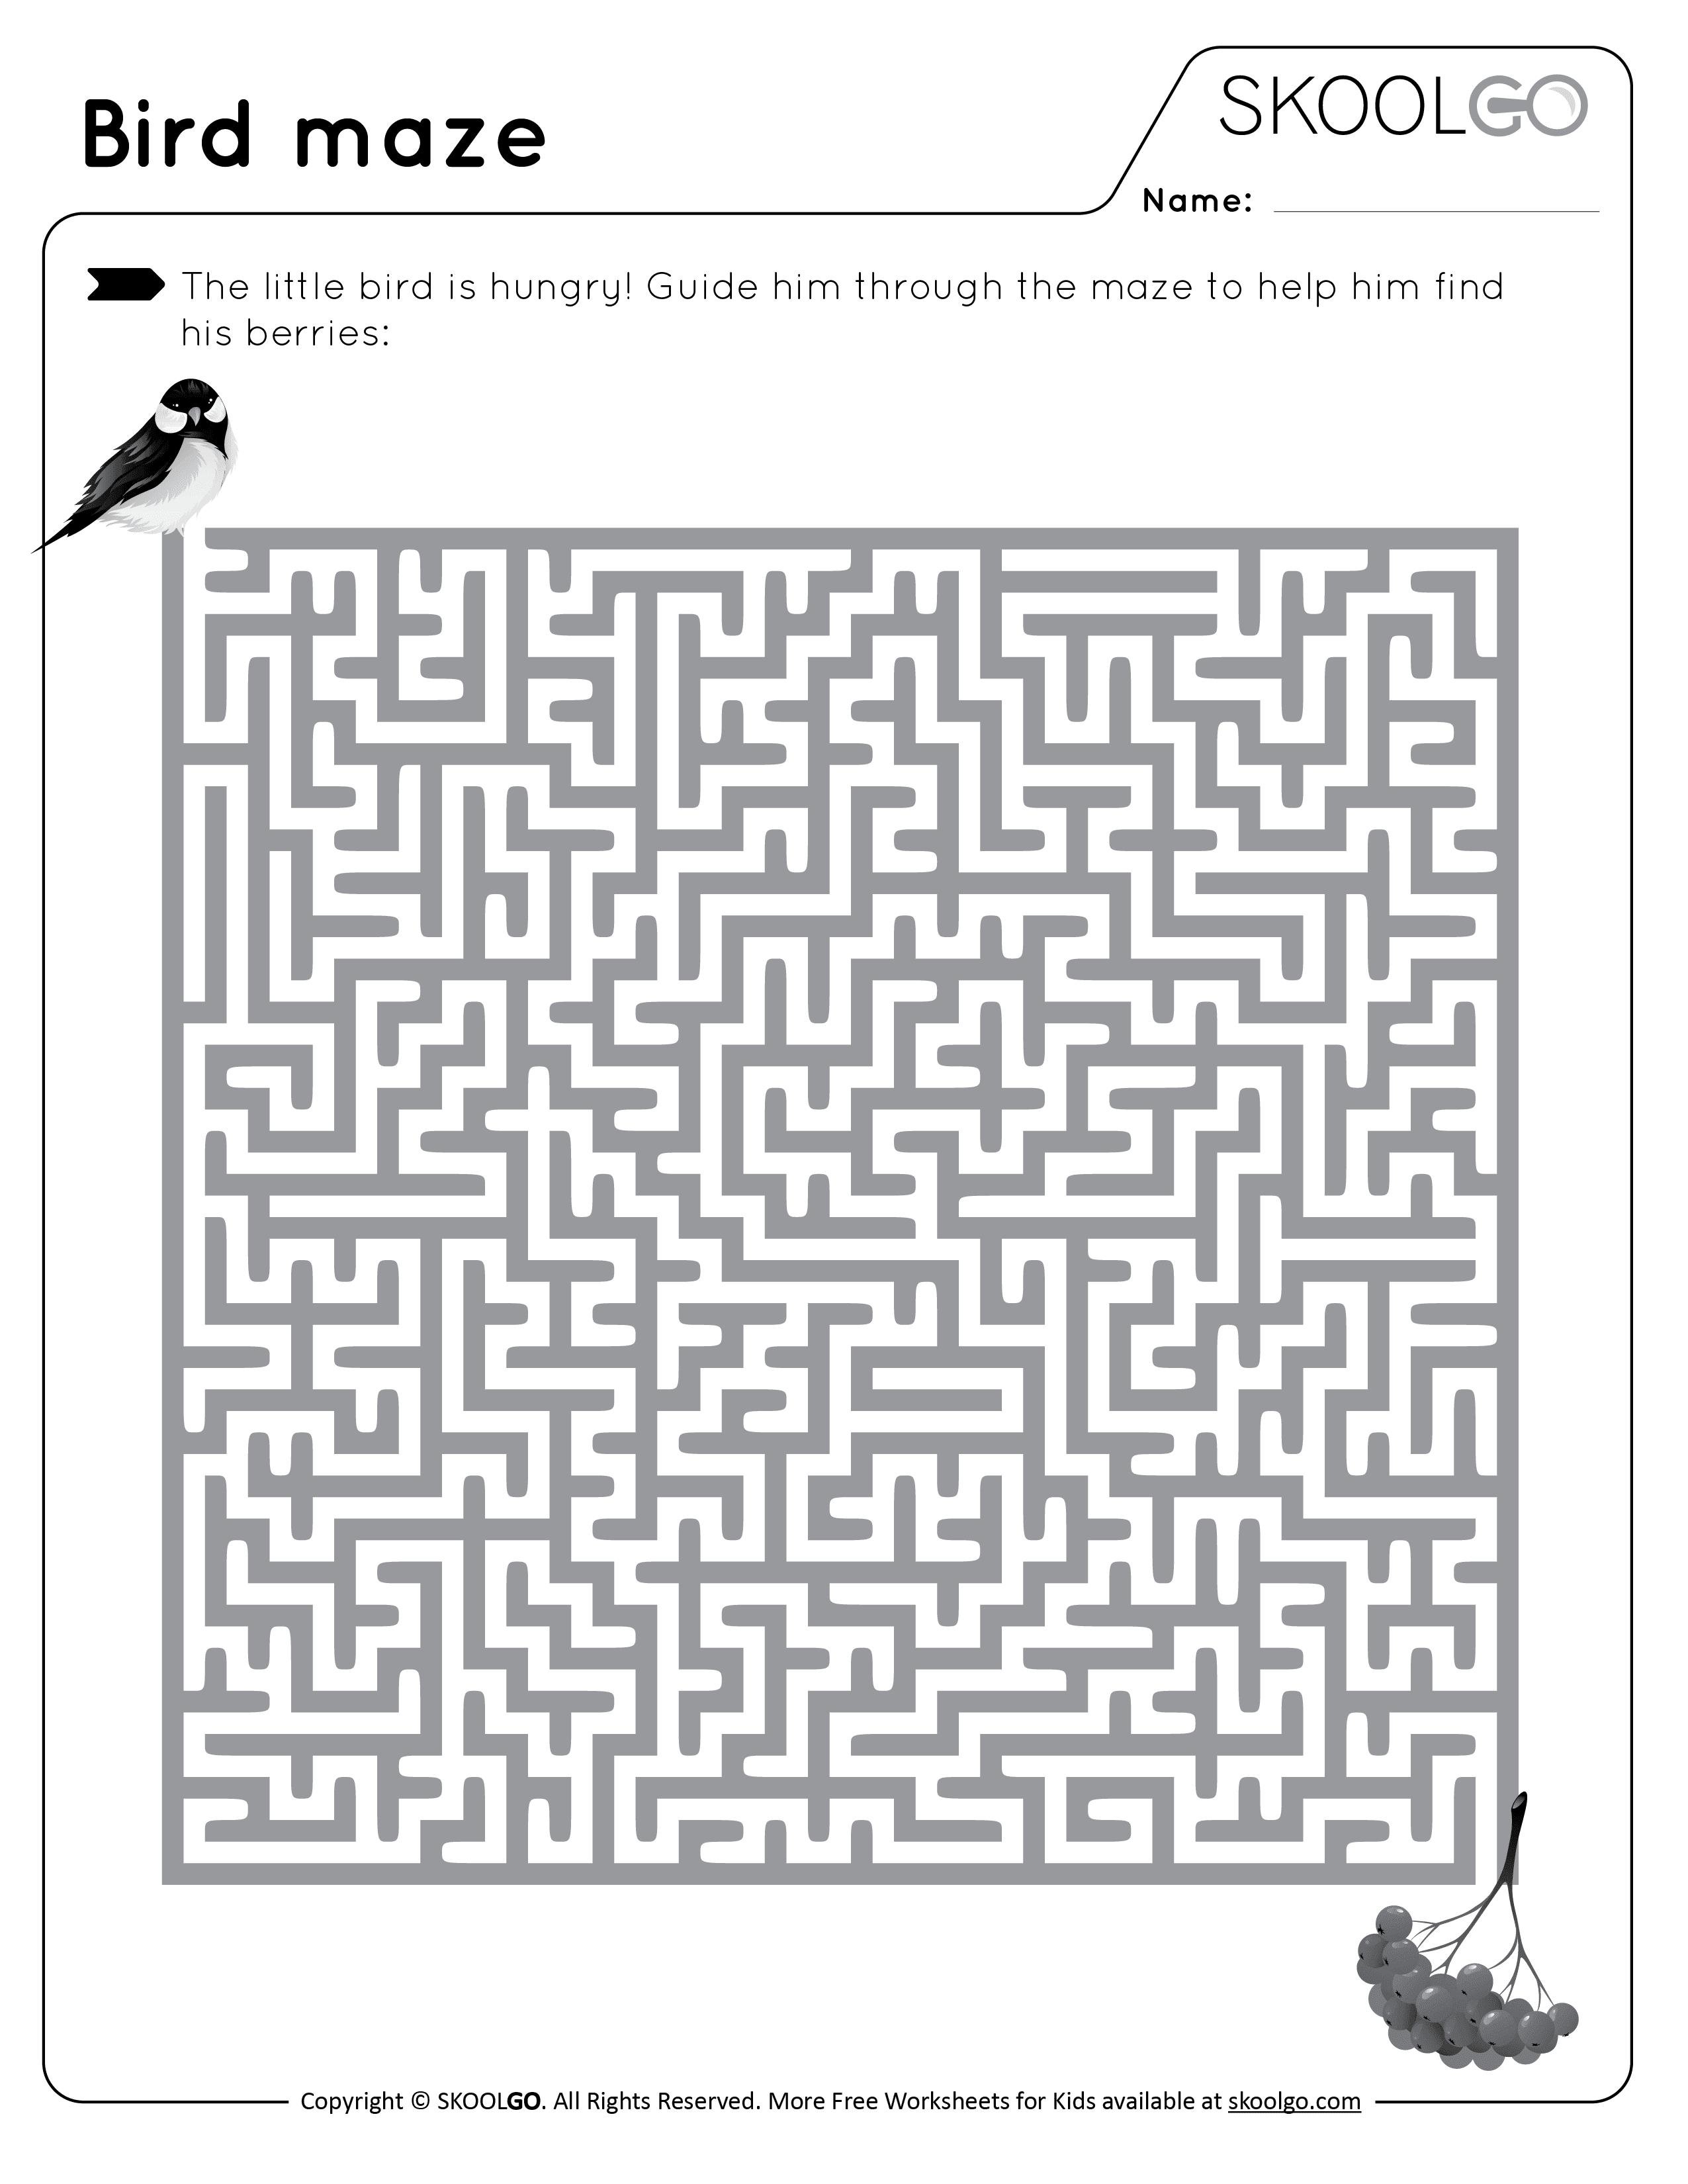 Bird Maze - Free Black and White Worksheet for Kids